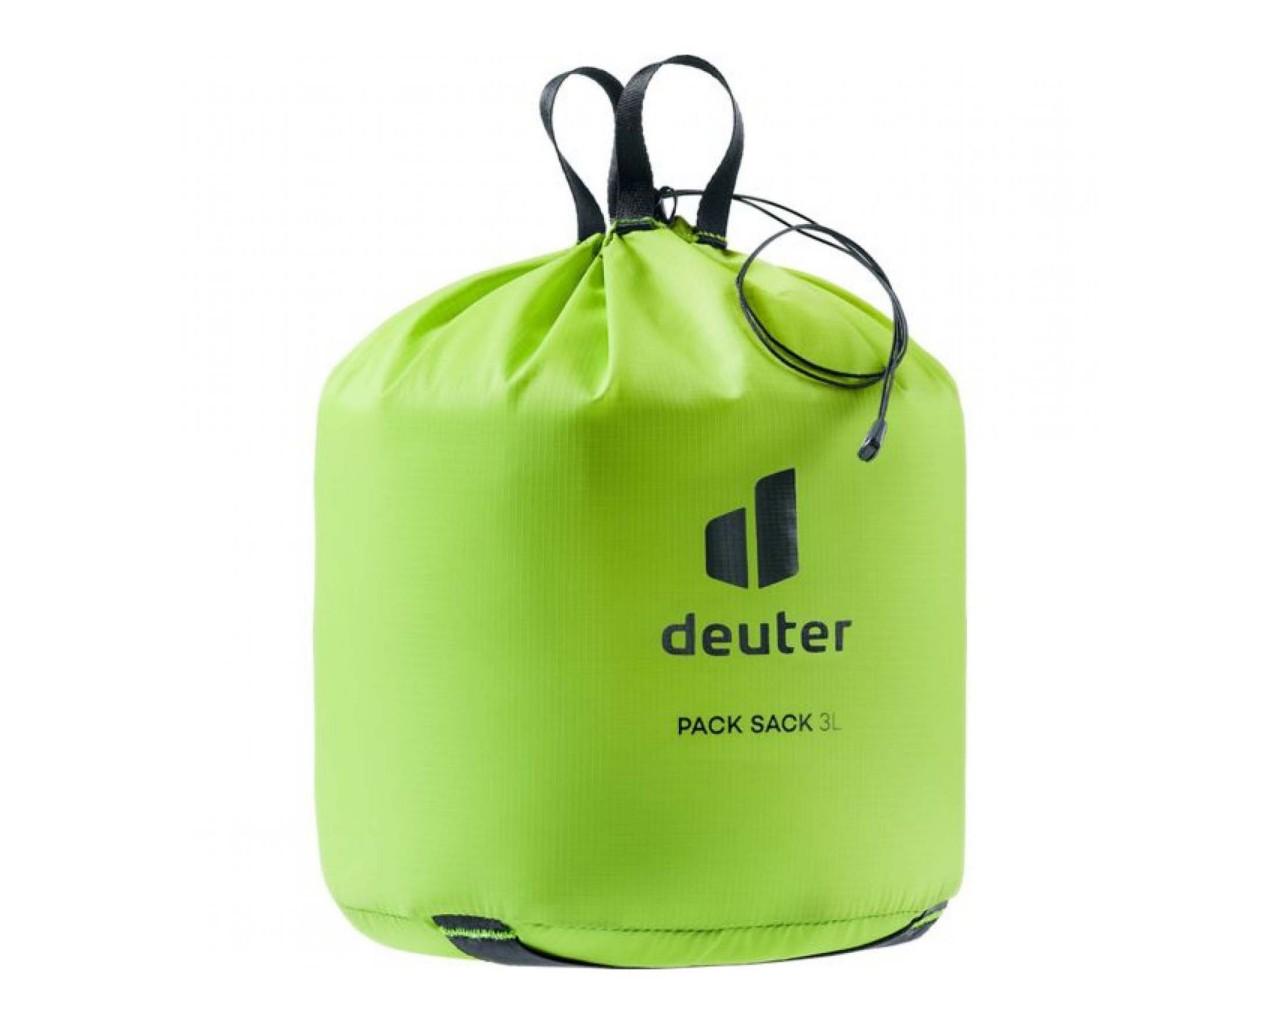 Deuter Pack Sack 3 Packtasche | citrus